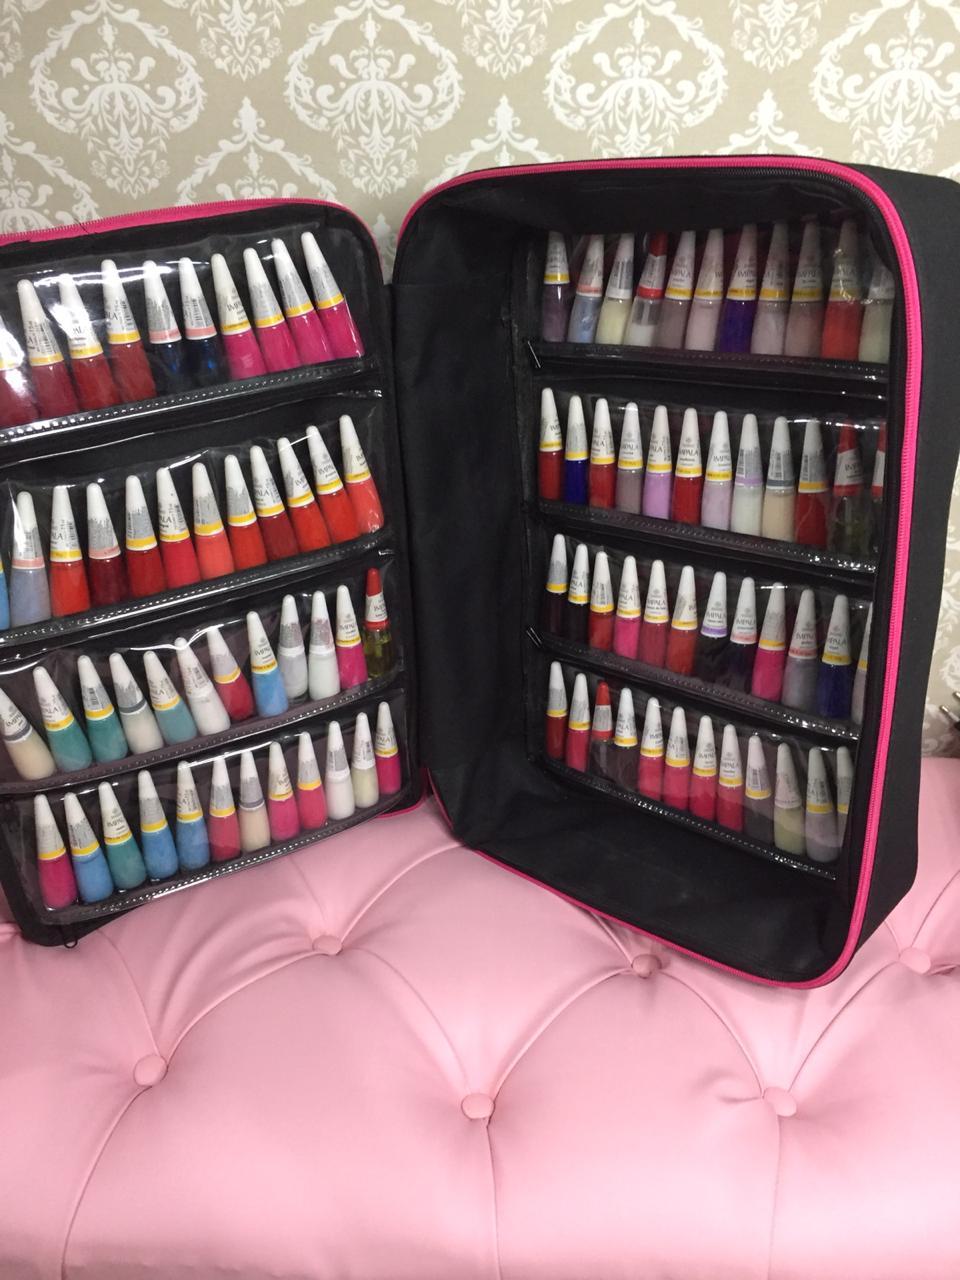 Maleta Mochila P/manicures P/90 Esmaltes Bolsa Pink  - Virtude Móveis